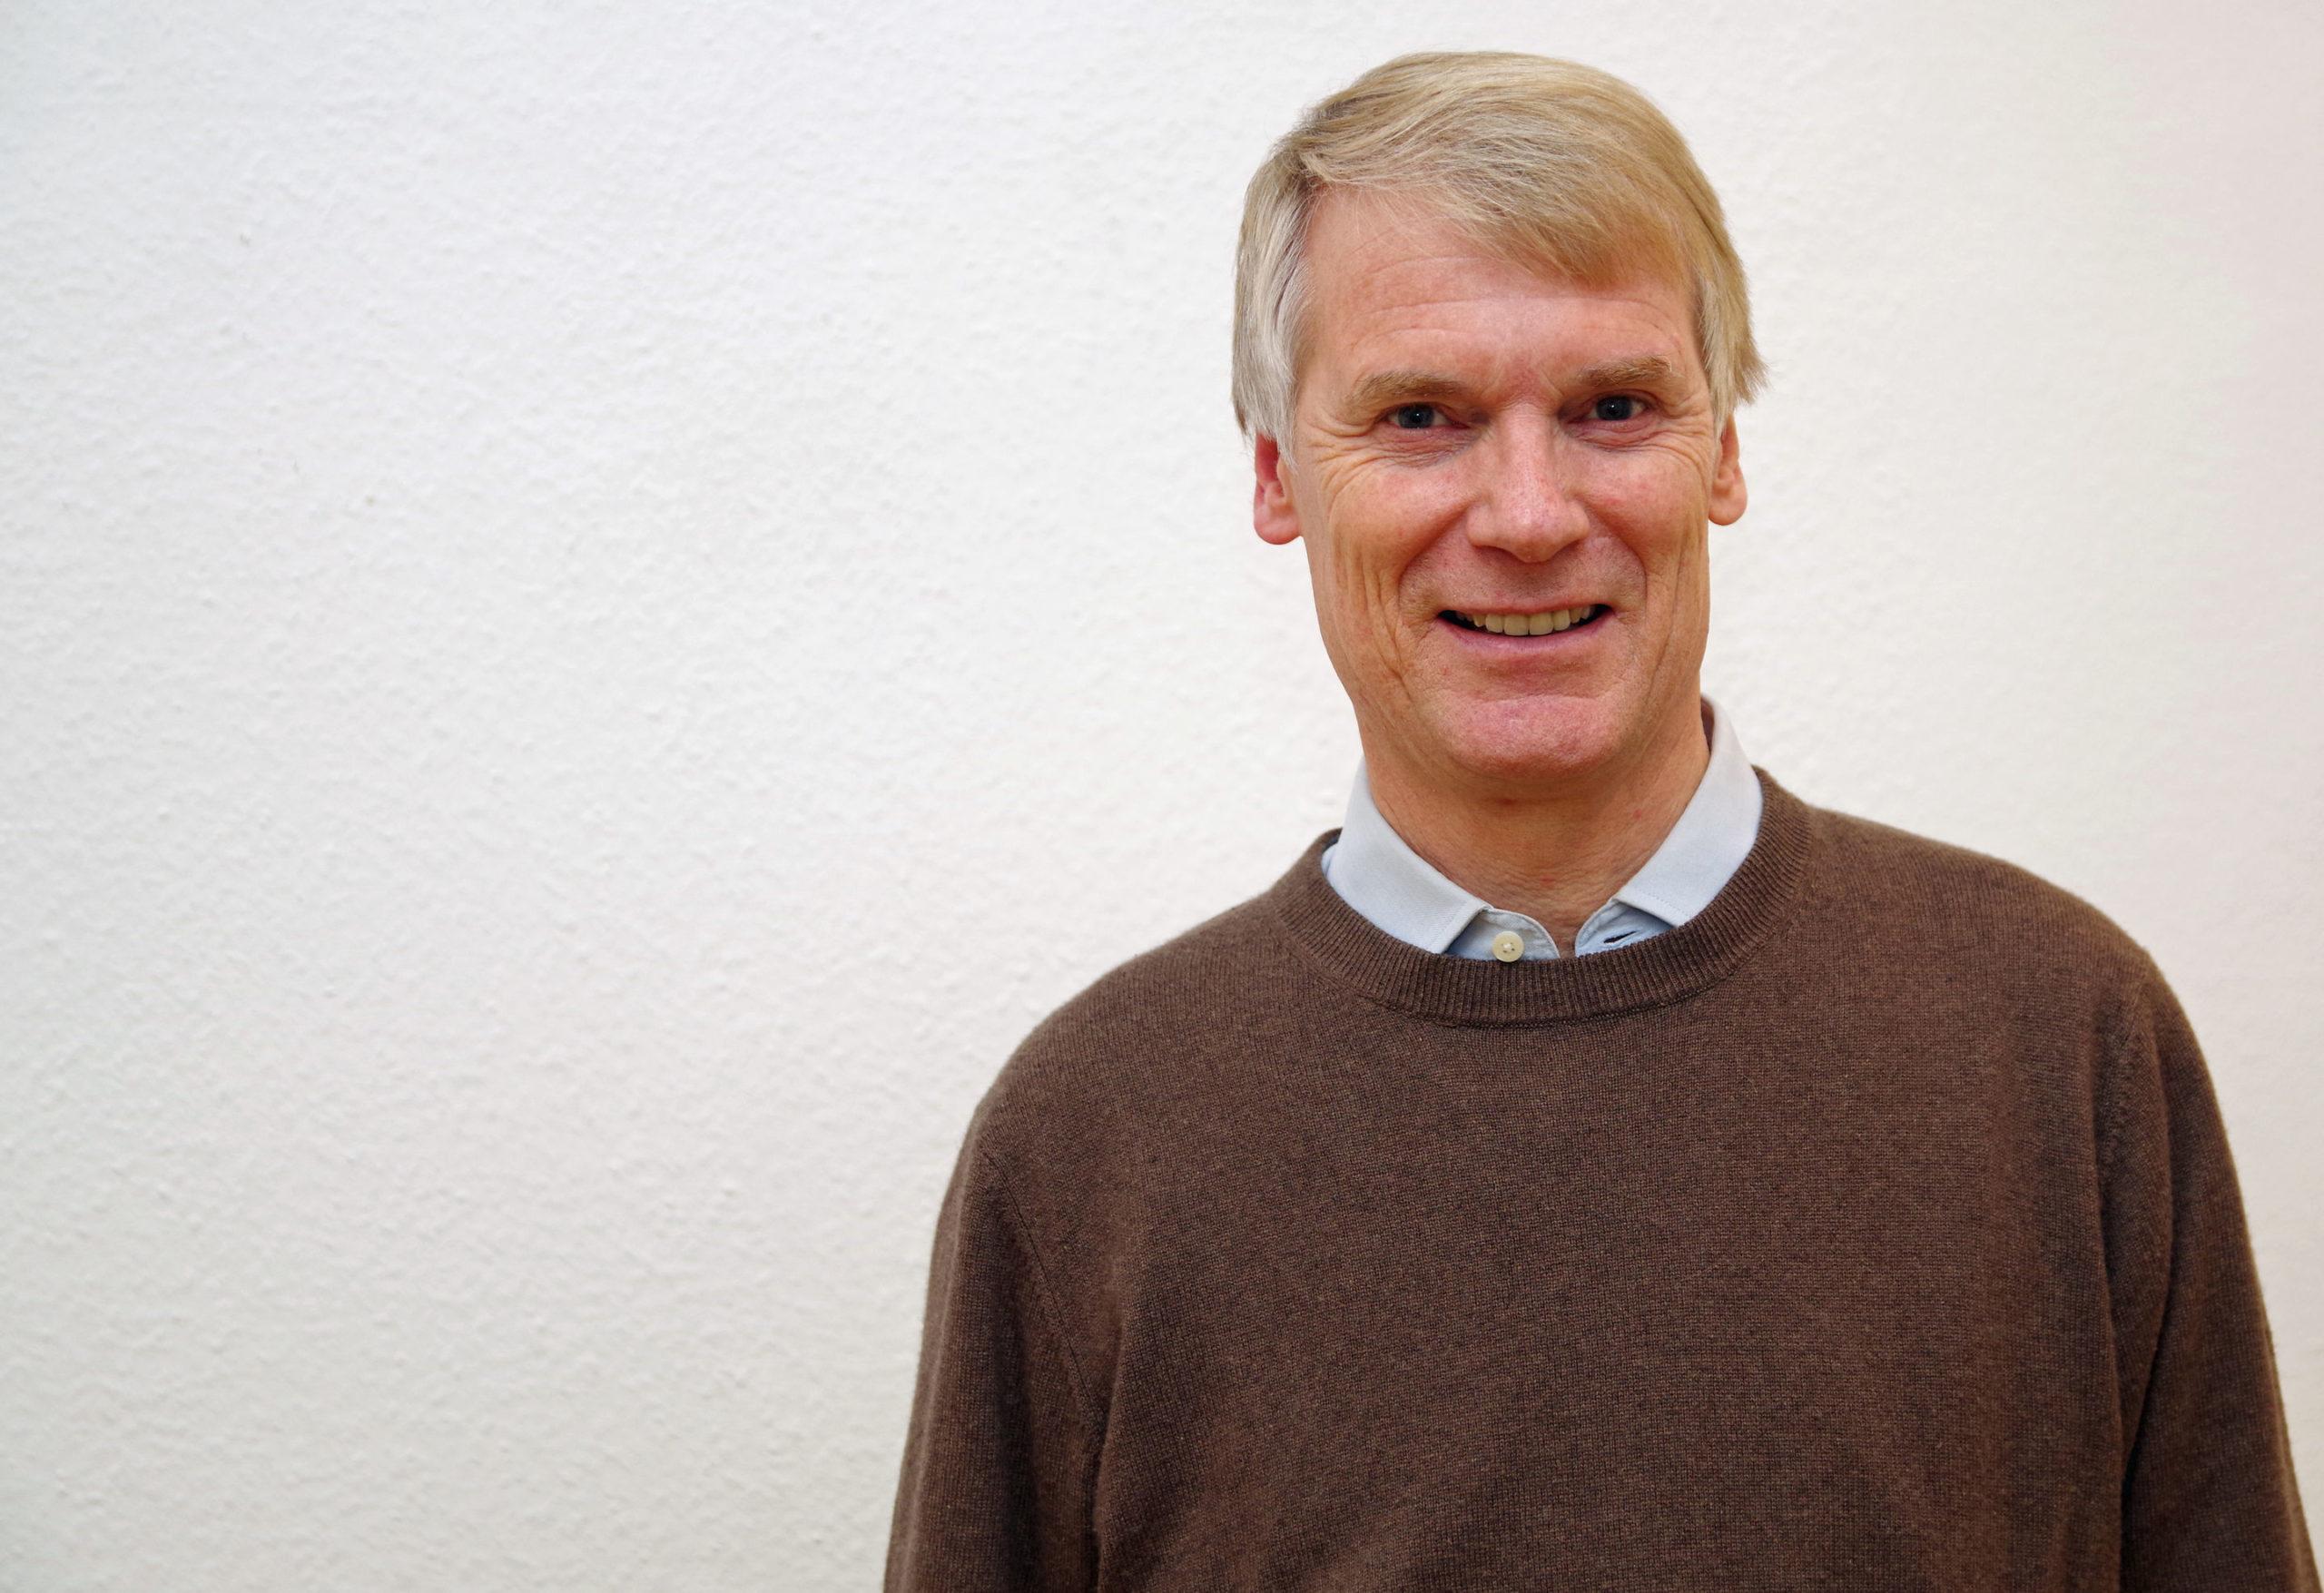 Thomas Carl Schwoerer